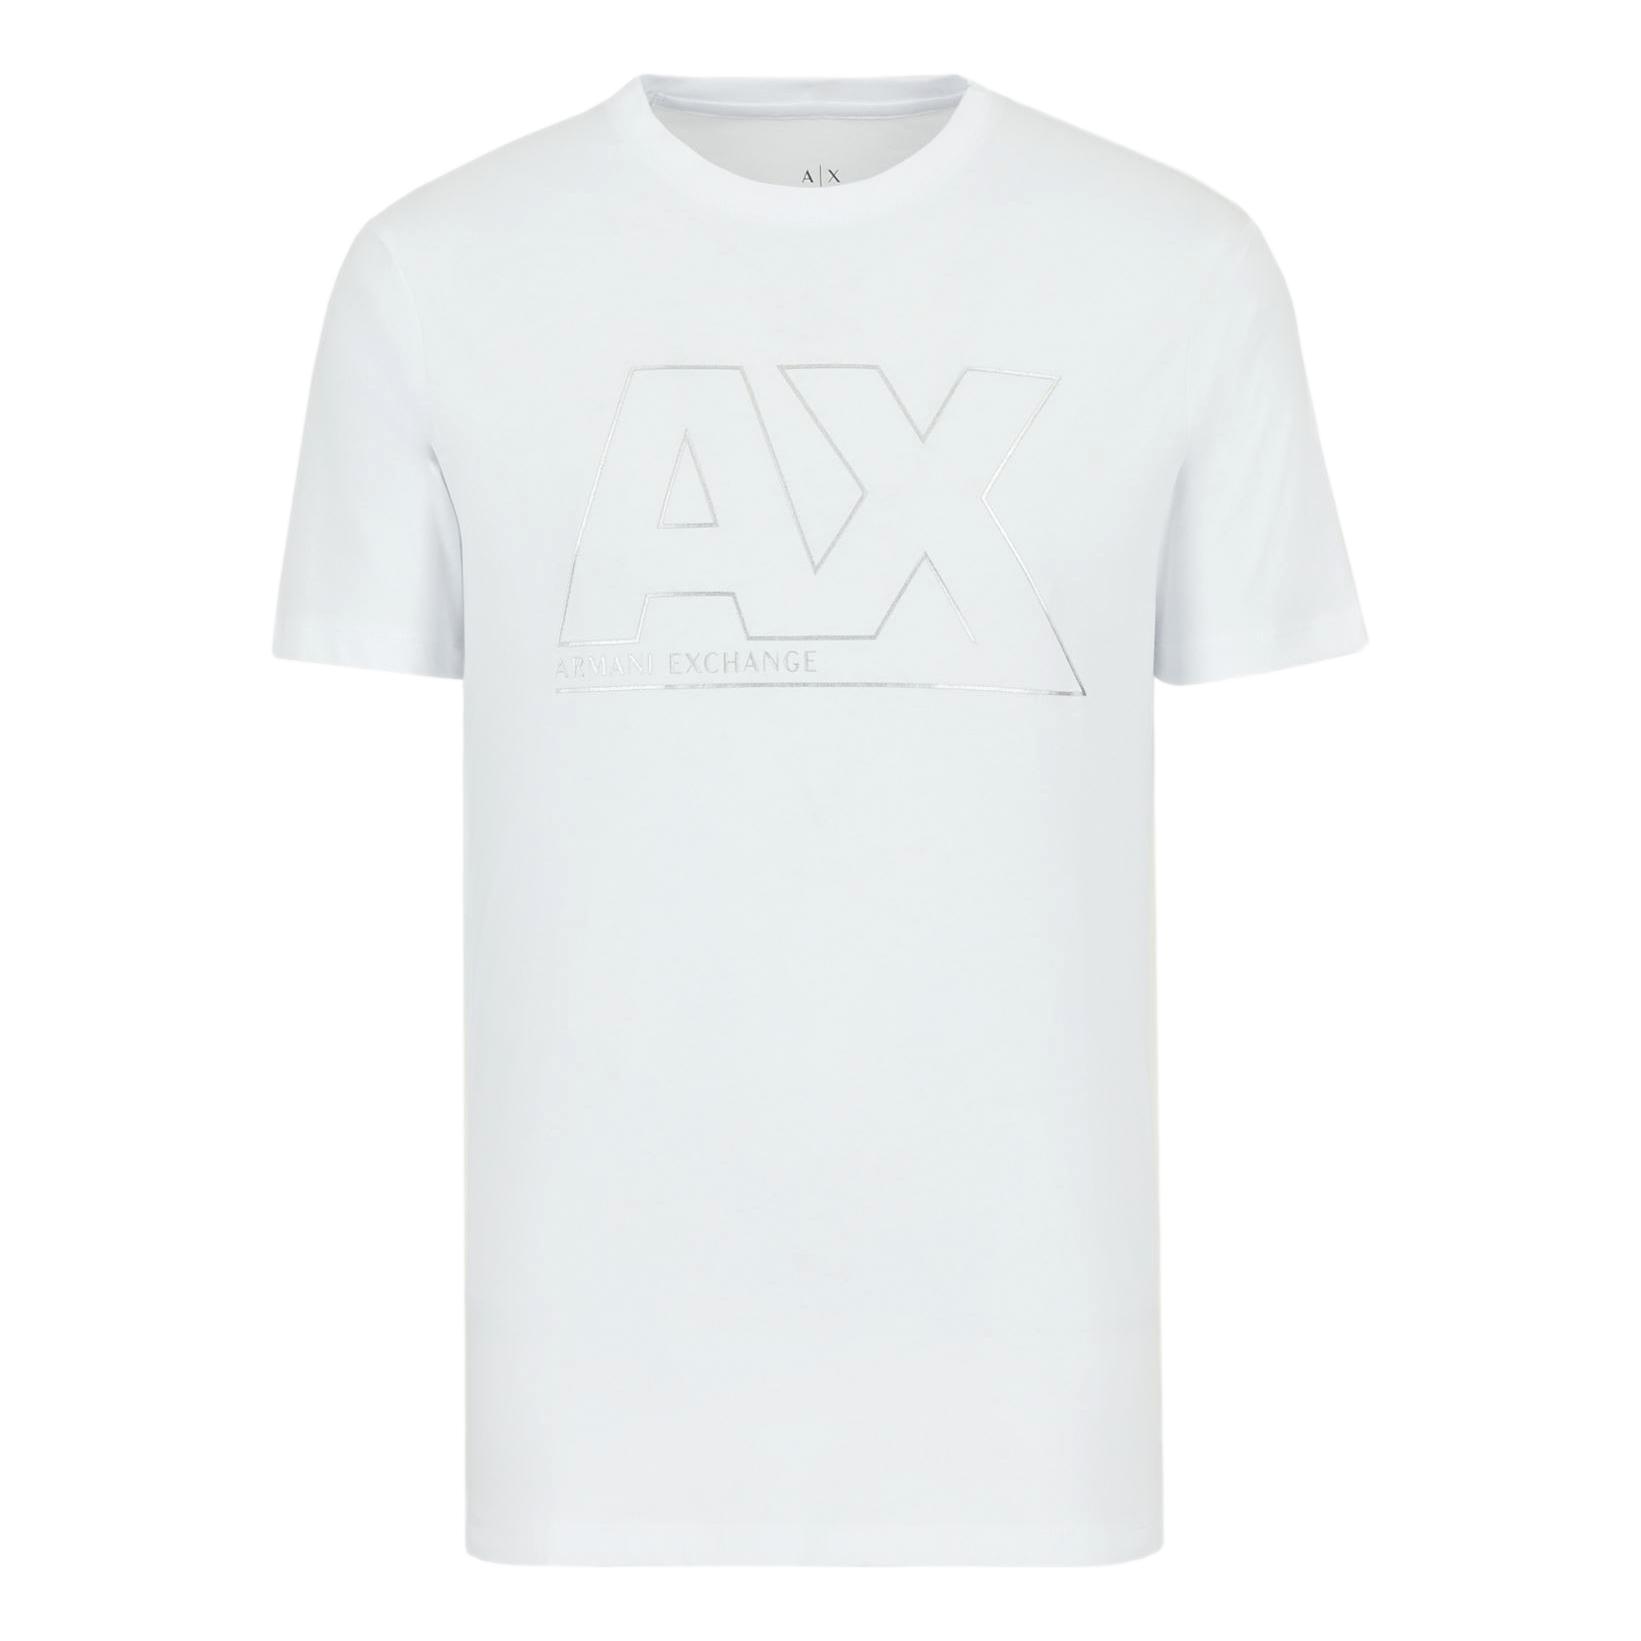 Slim fit T-shirt with shiny maxi-logo ARMANI EXCHANGE      6KZTFA ZJBVZ1100